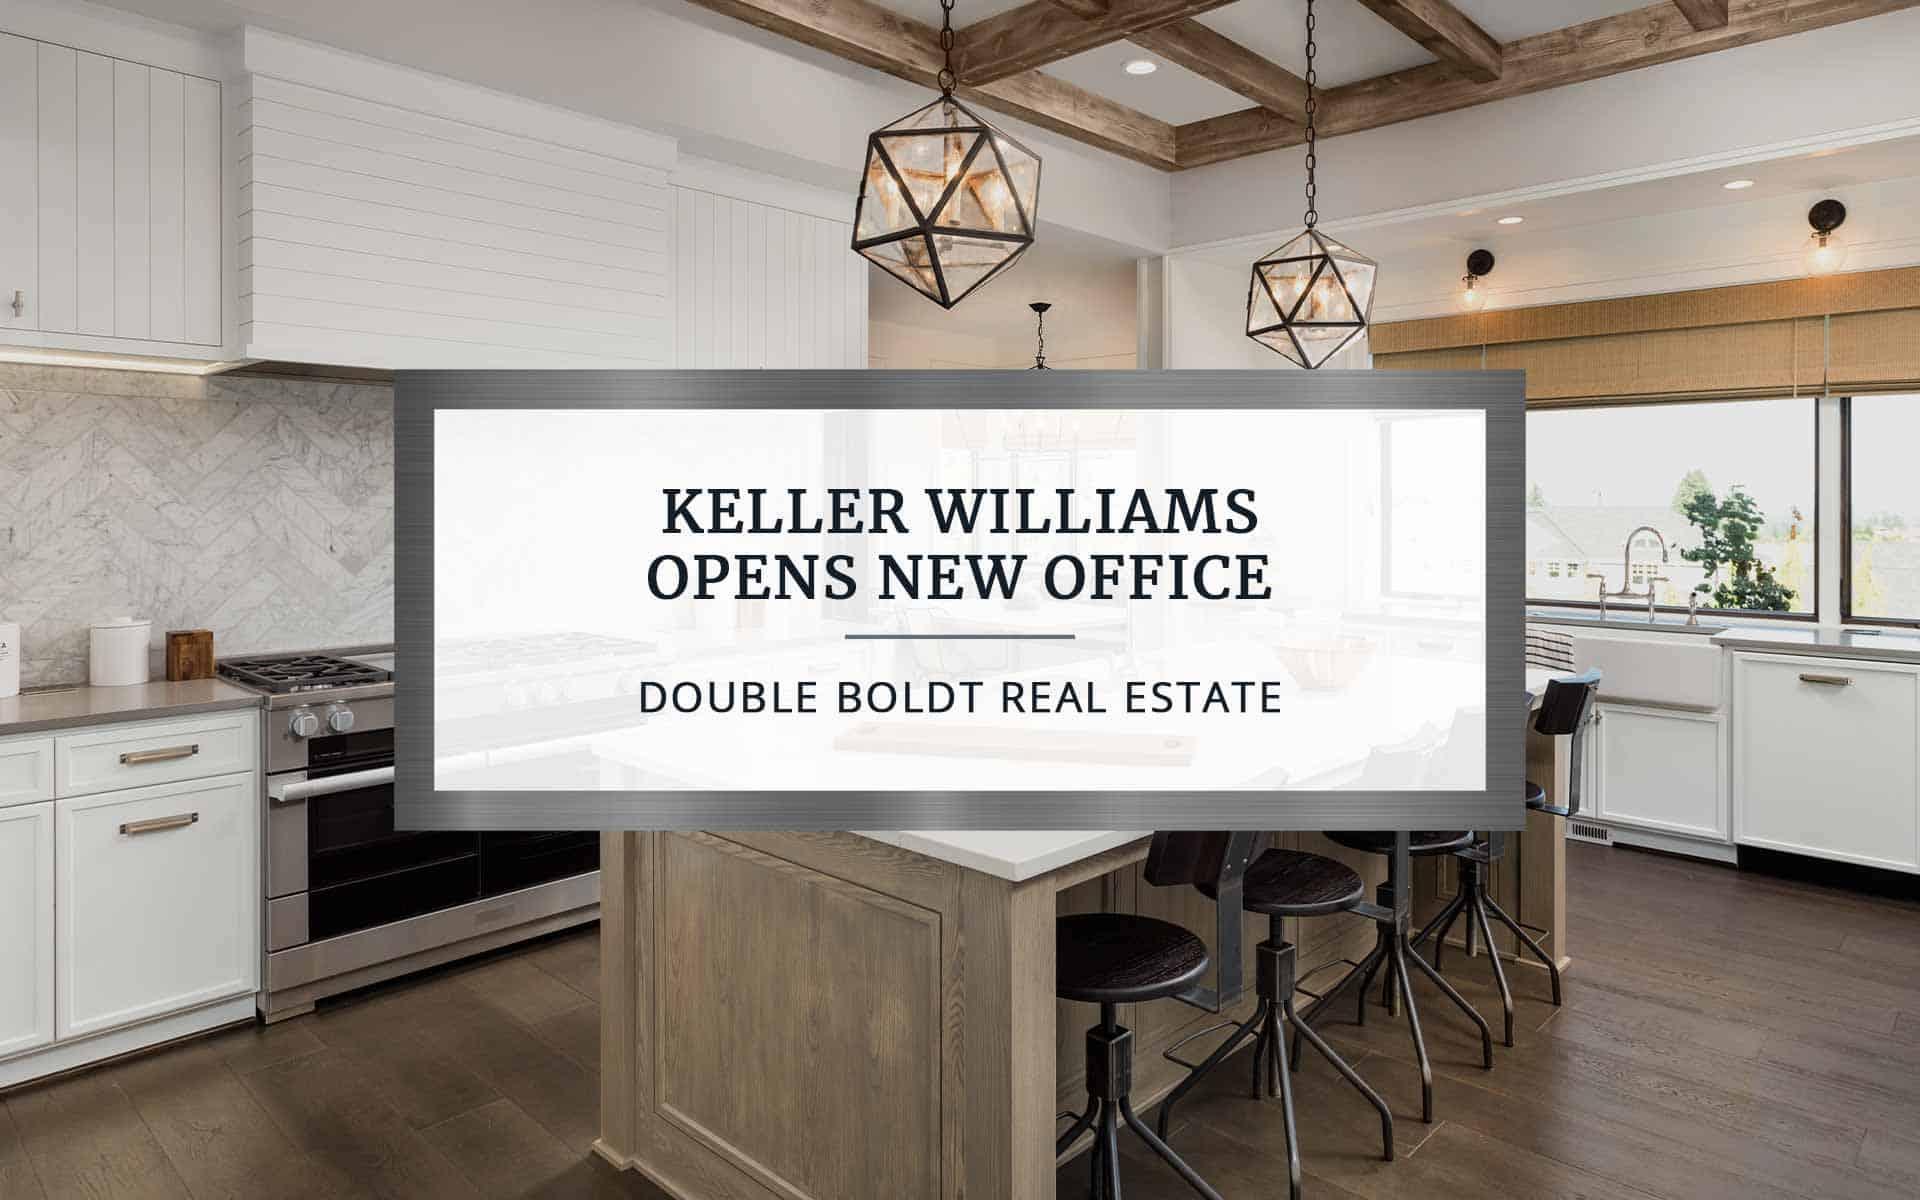 Keller Williams Opens New Office